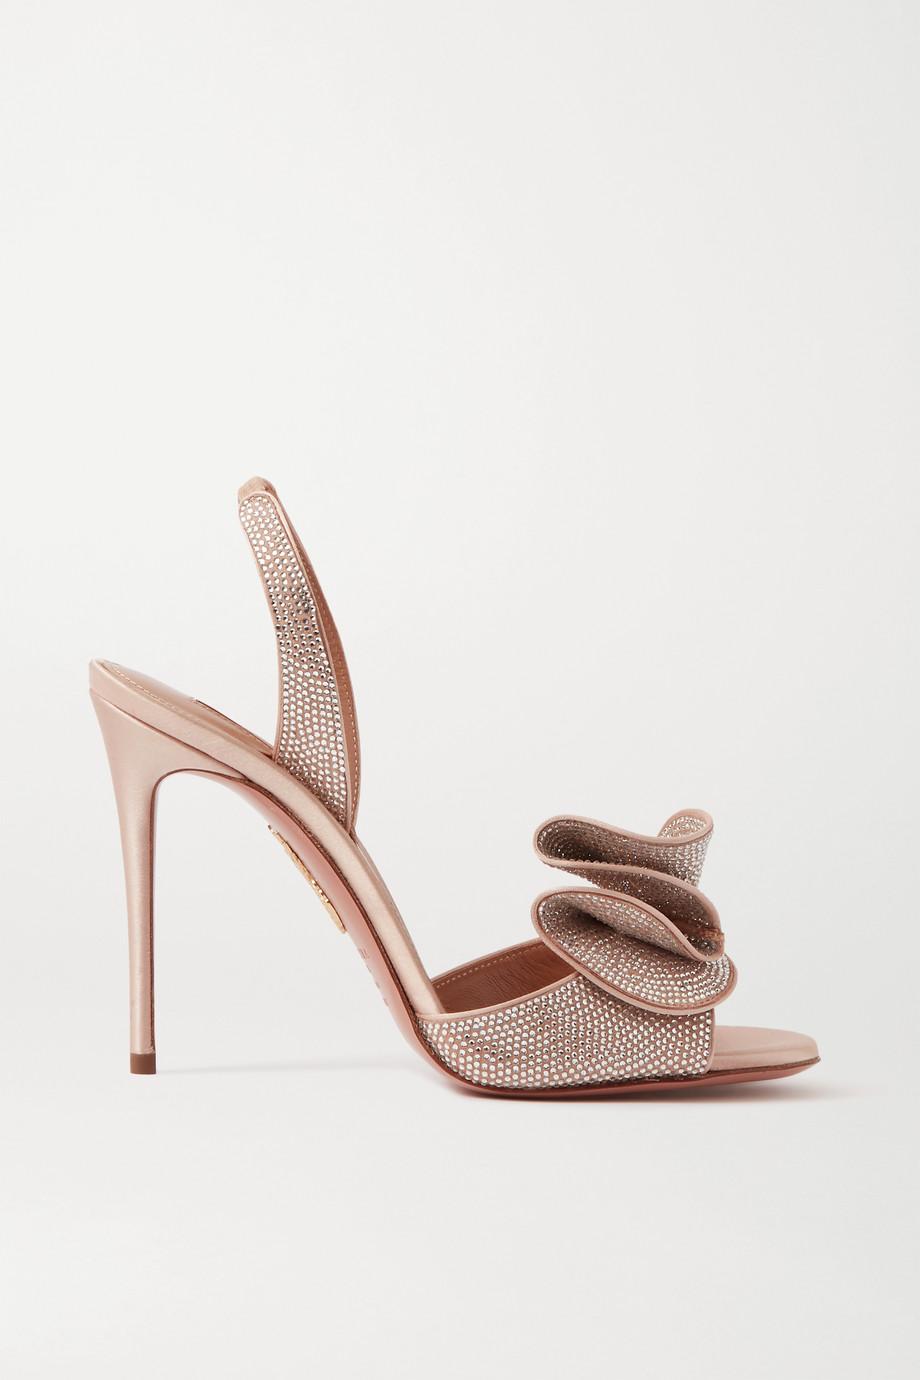 Aquazzura Cherry Crystal 105 ruffled embellished satin slingback sandals